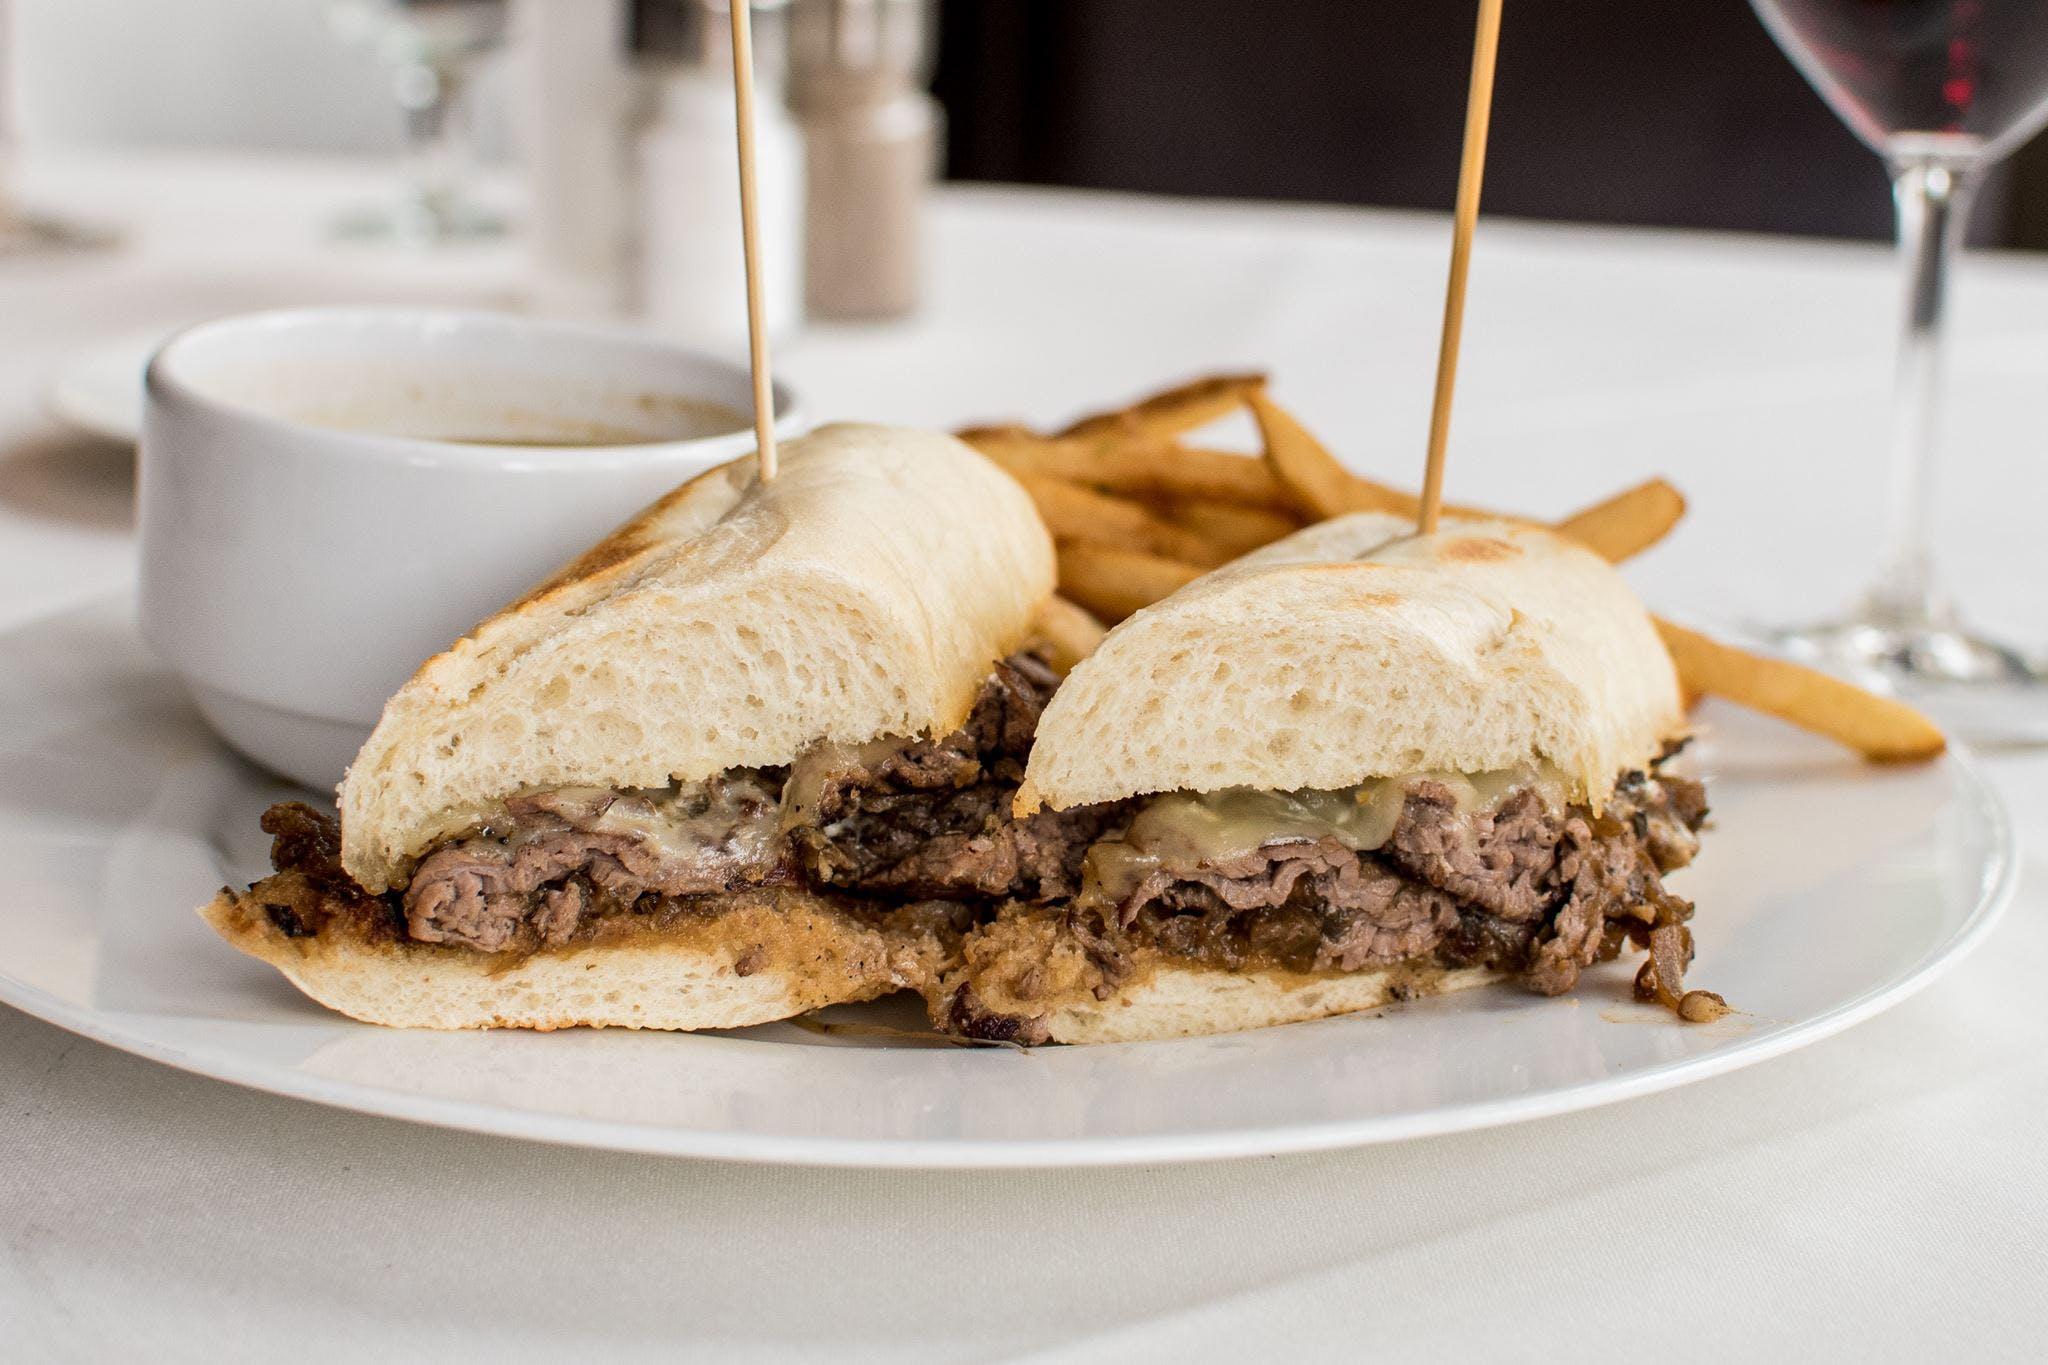 Johnny Delmonico's Steakhouse in Madison - Highlight